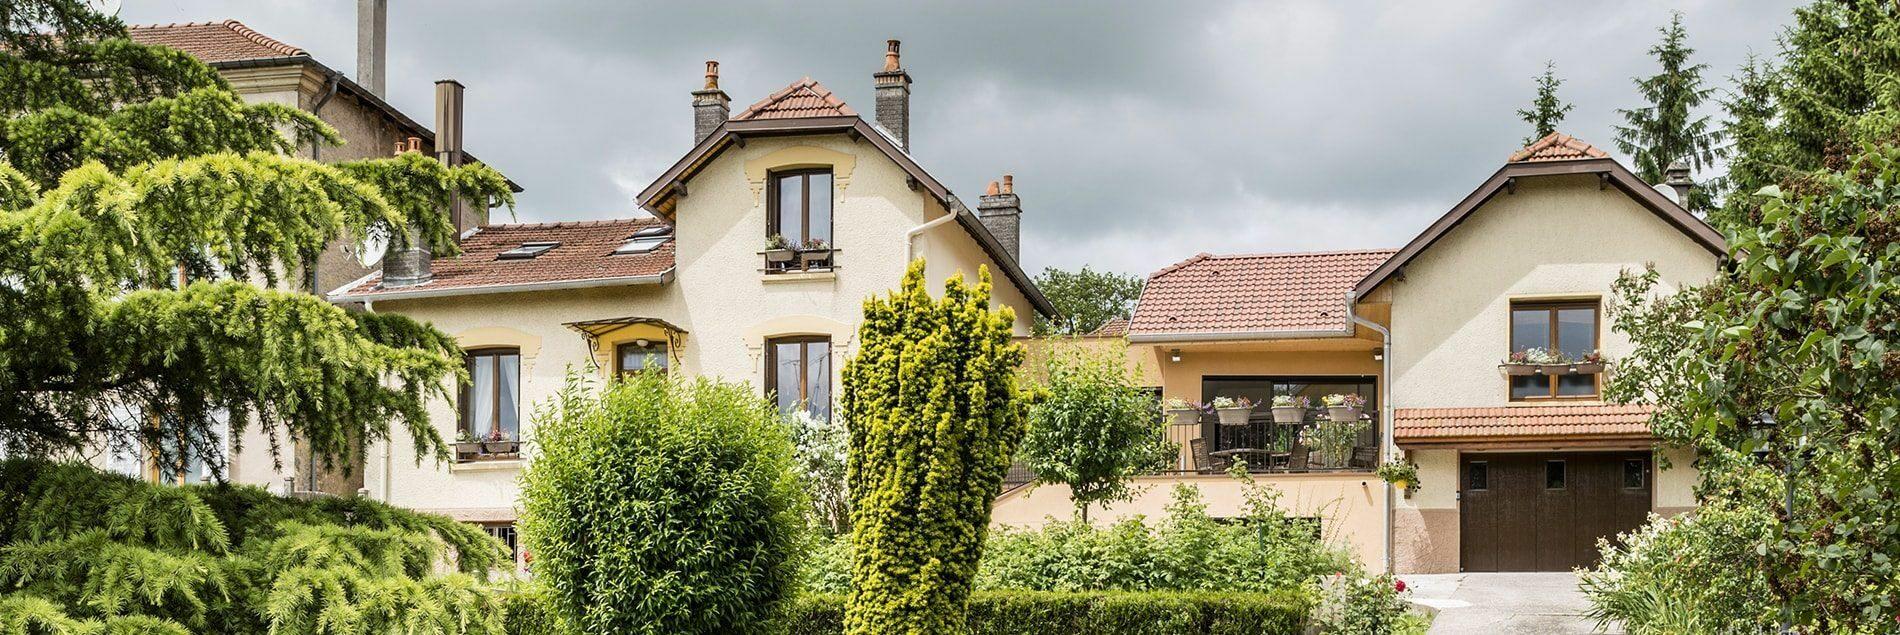 Agrandir sa maison à Besançon